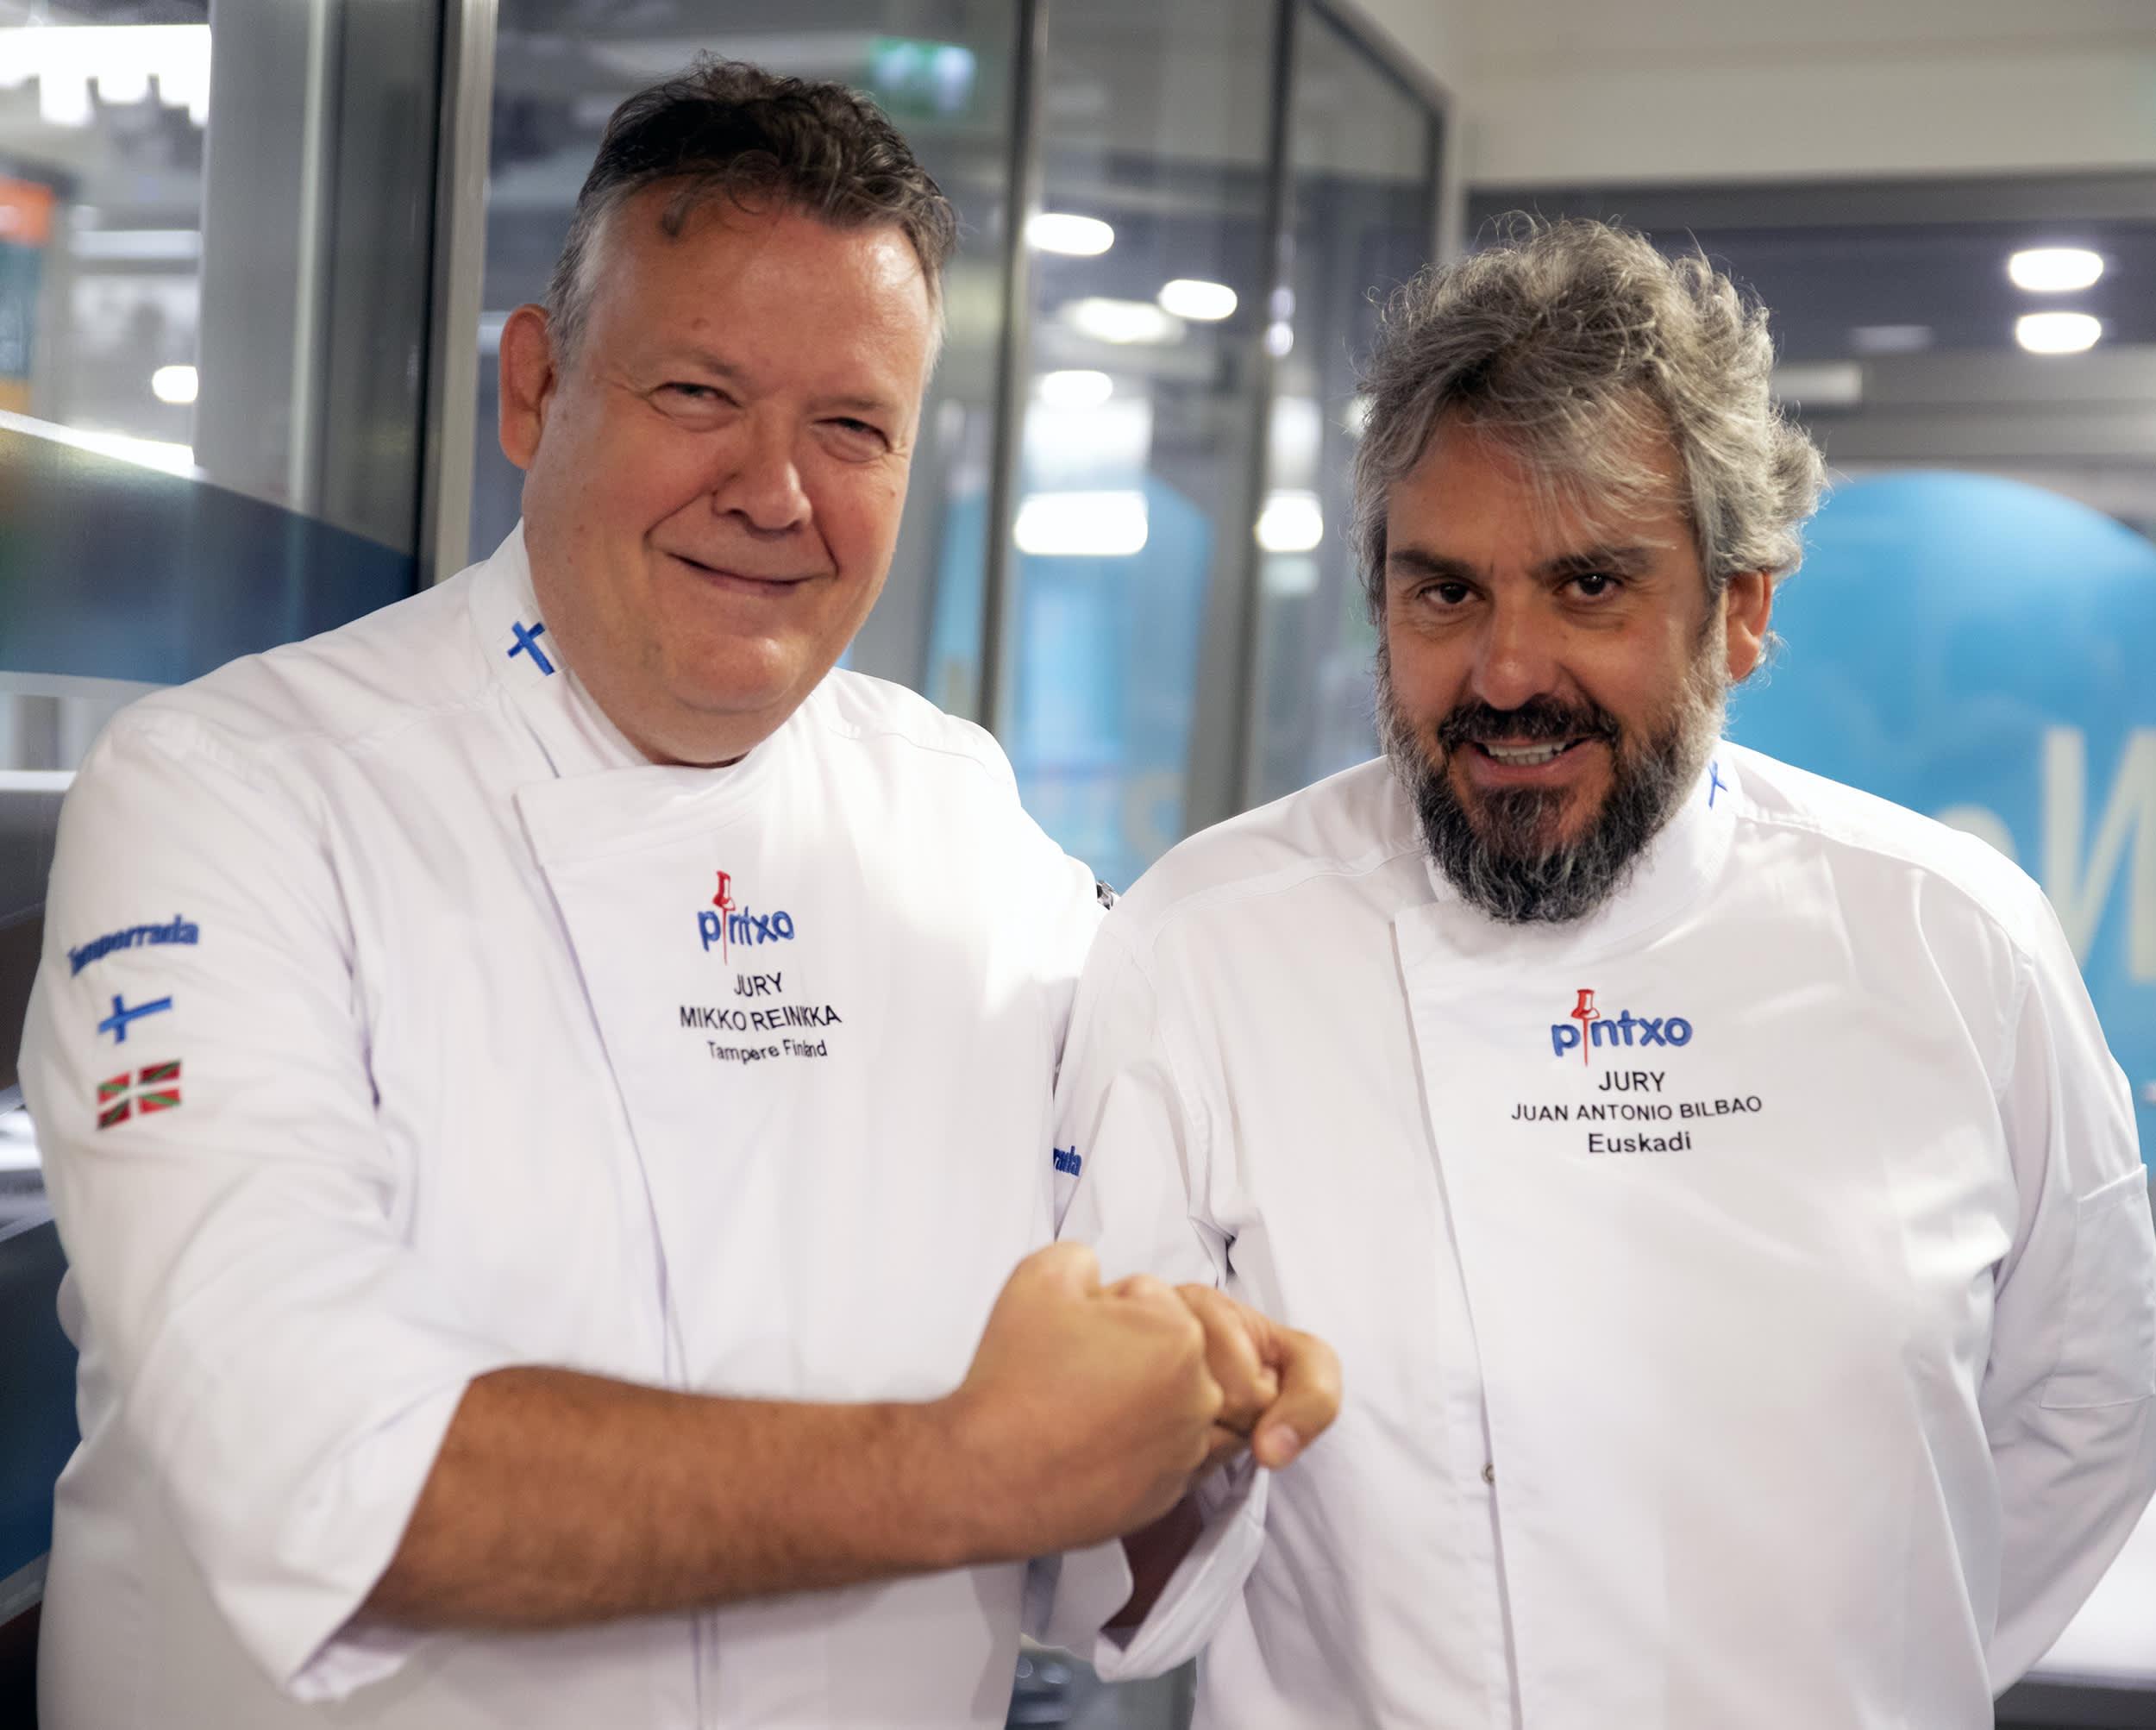 MIkko Reinikka ja Juan Antonio Bilbao